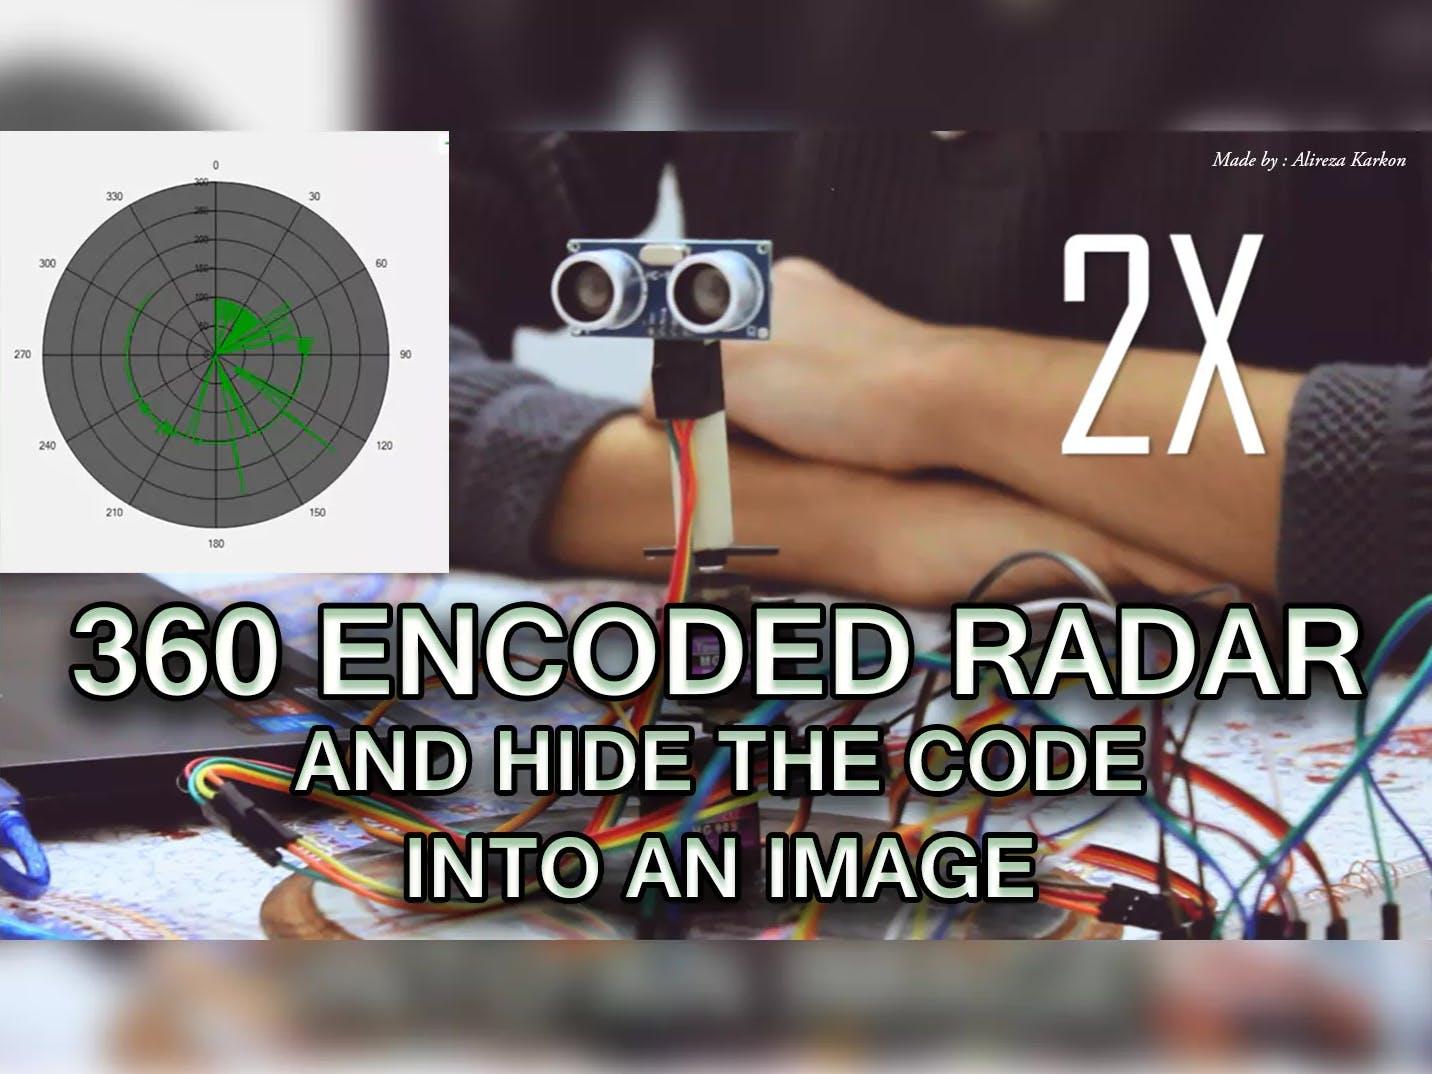 360 Radar (that encodes data onto an image)